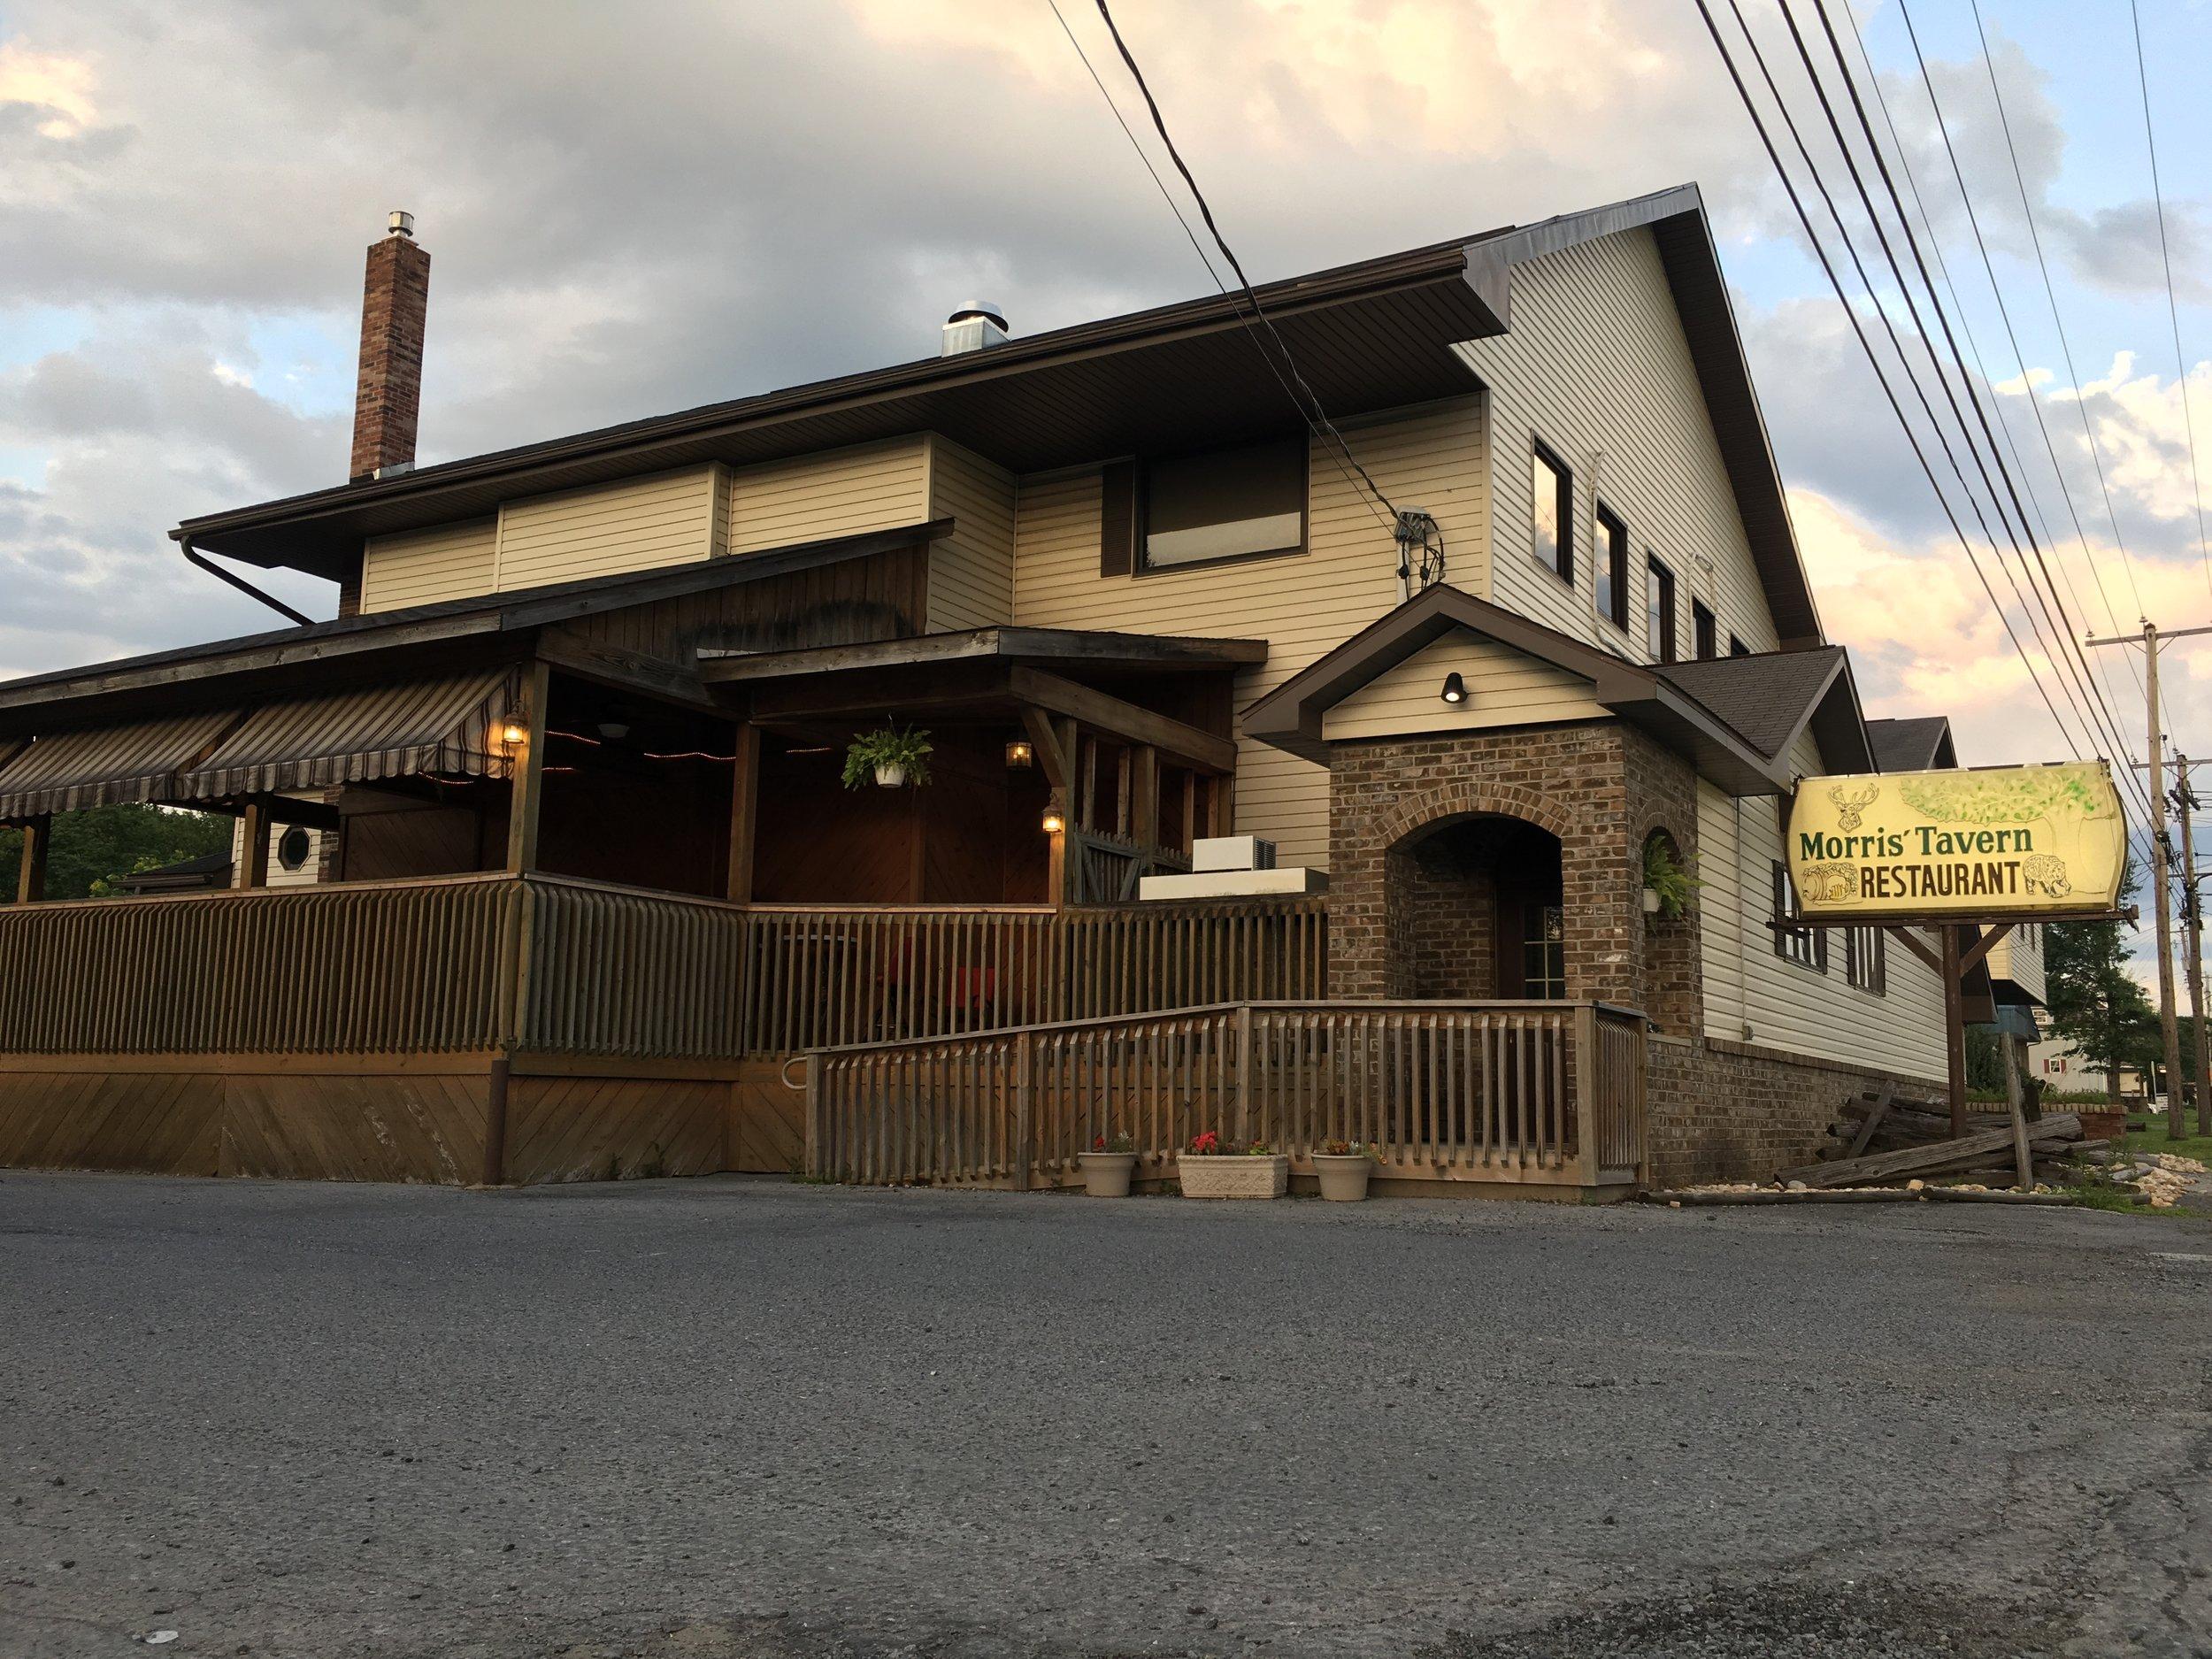 Morris' Tavern & Restaurant